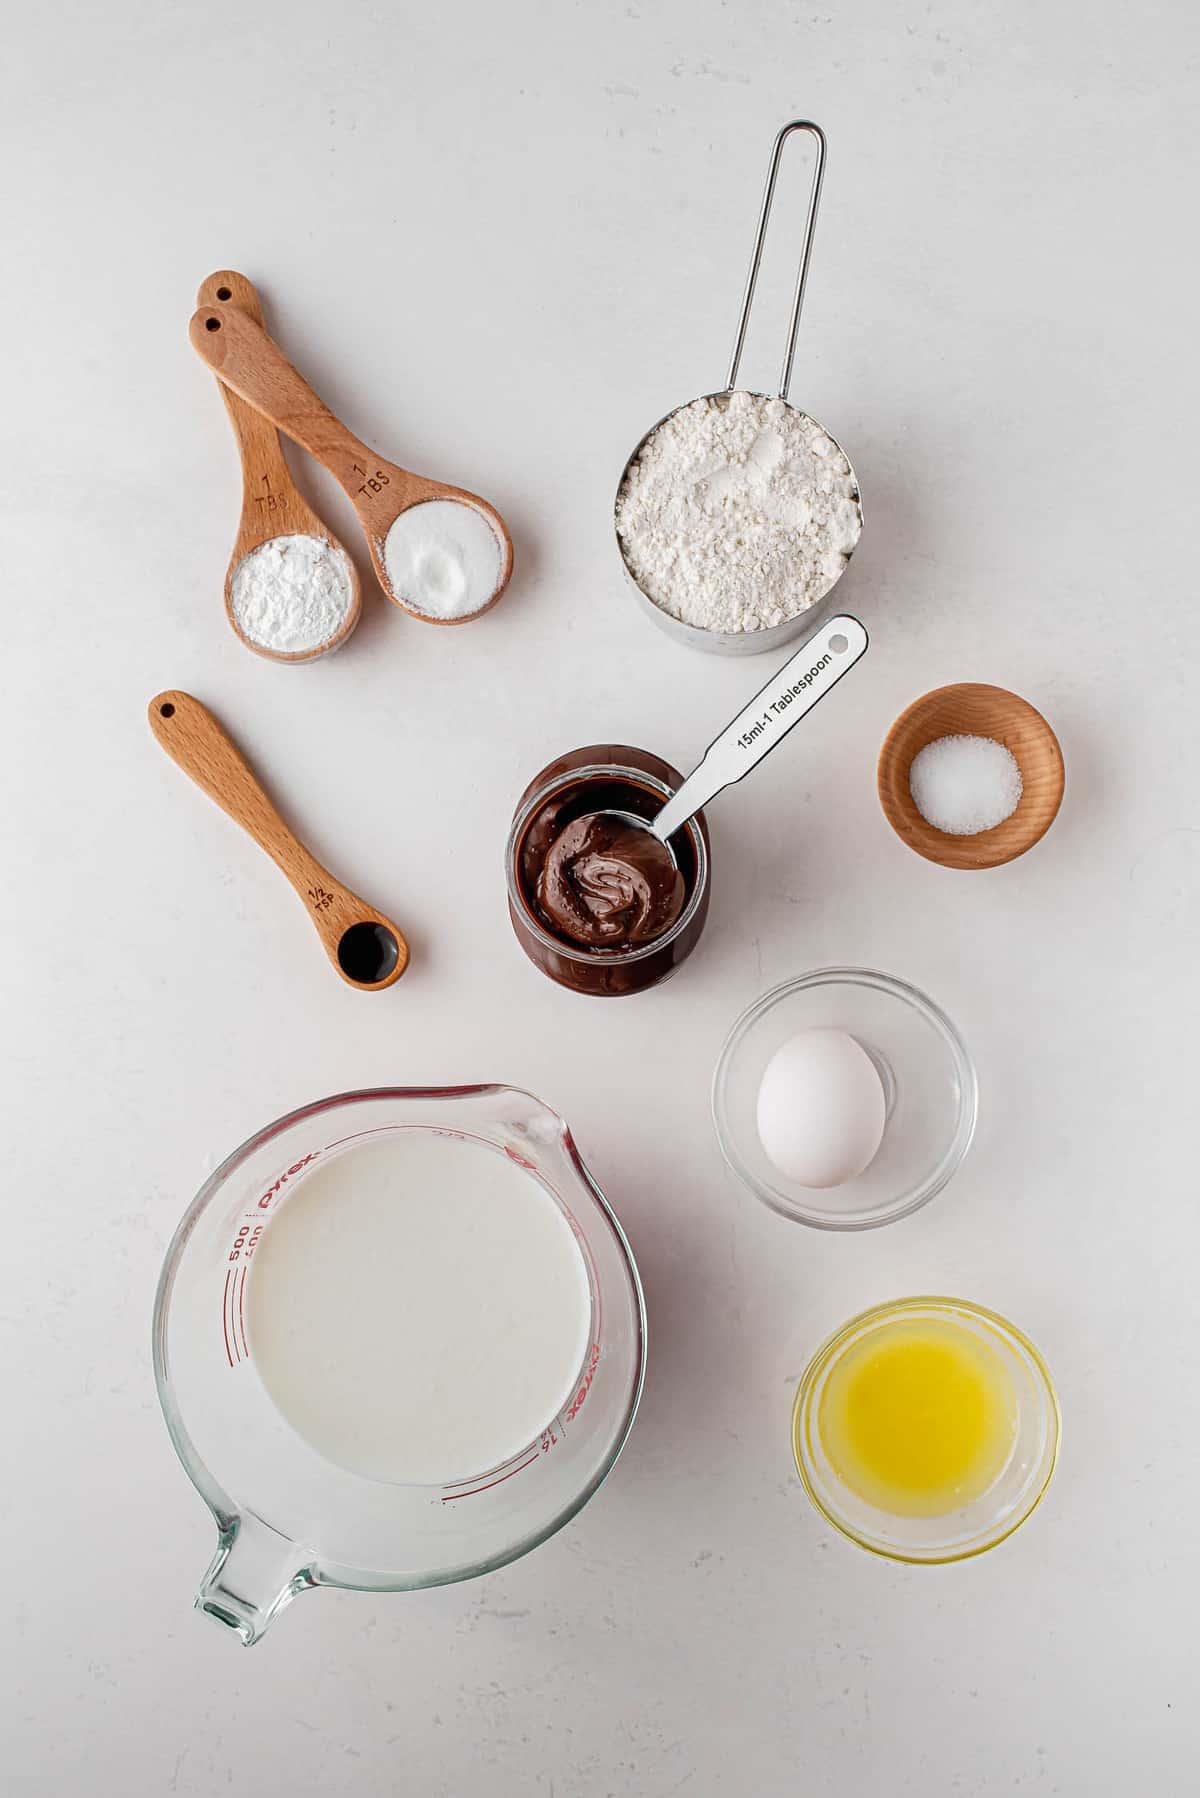 Overhead view of ingredients: flour, butter, vanilla, salt, baking powder, egg, buttermilk, nutella, and more.